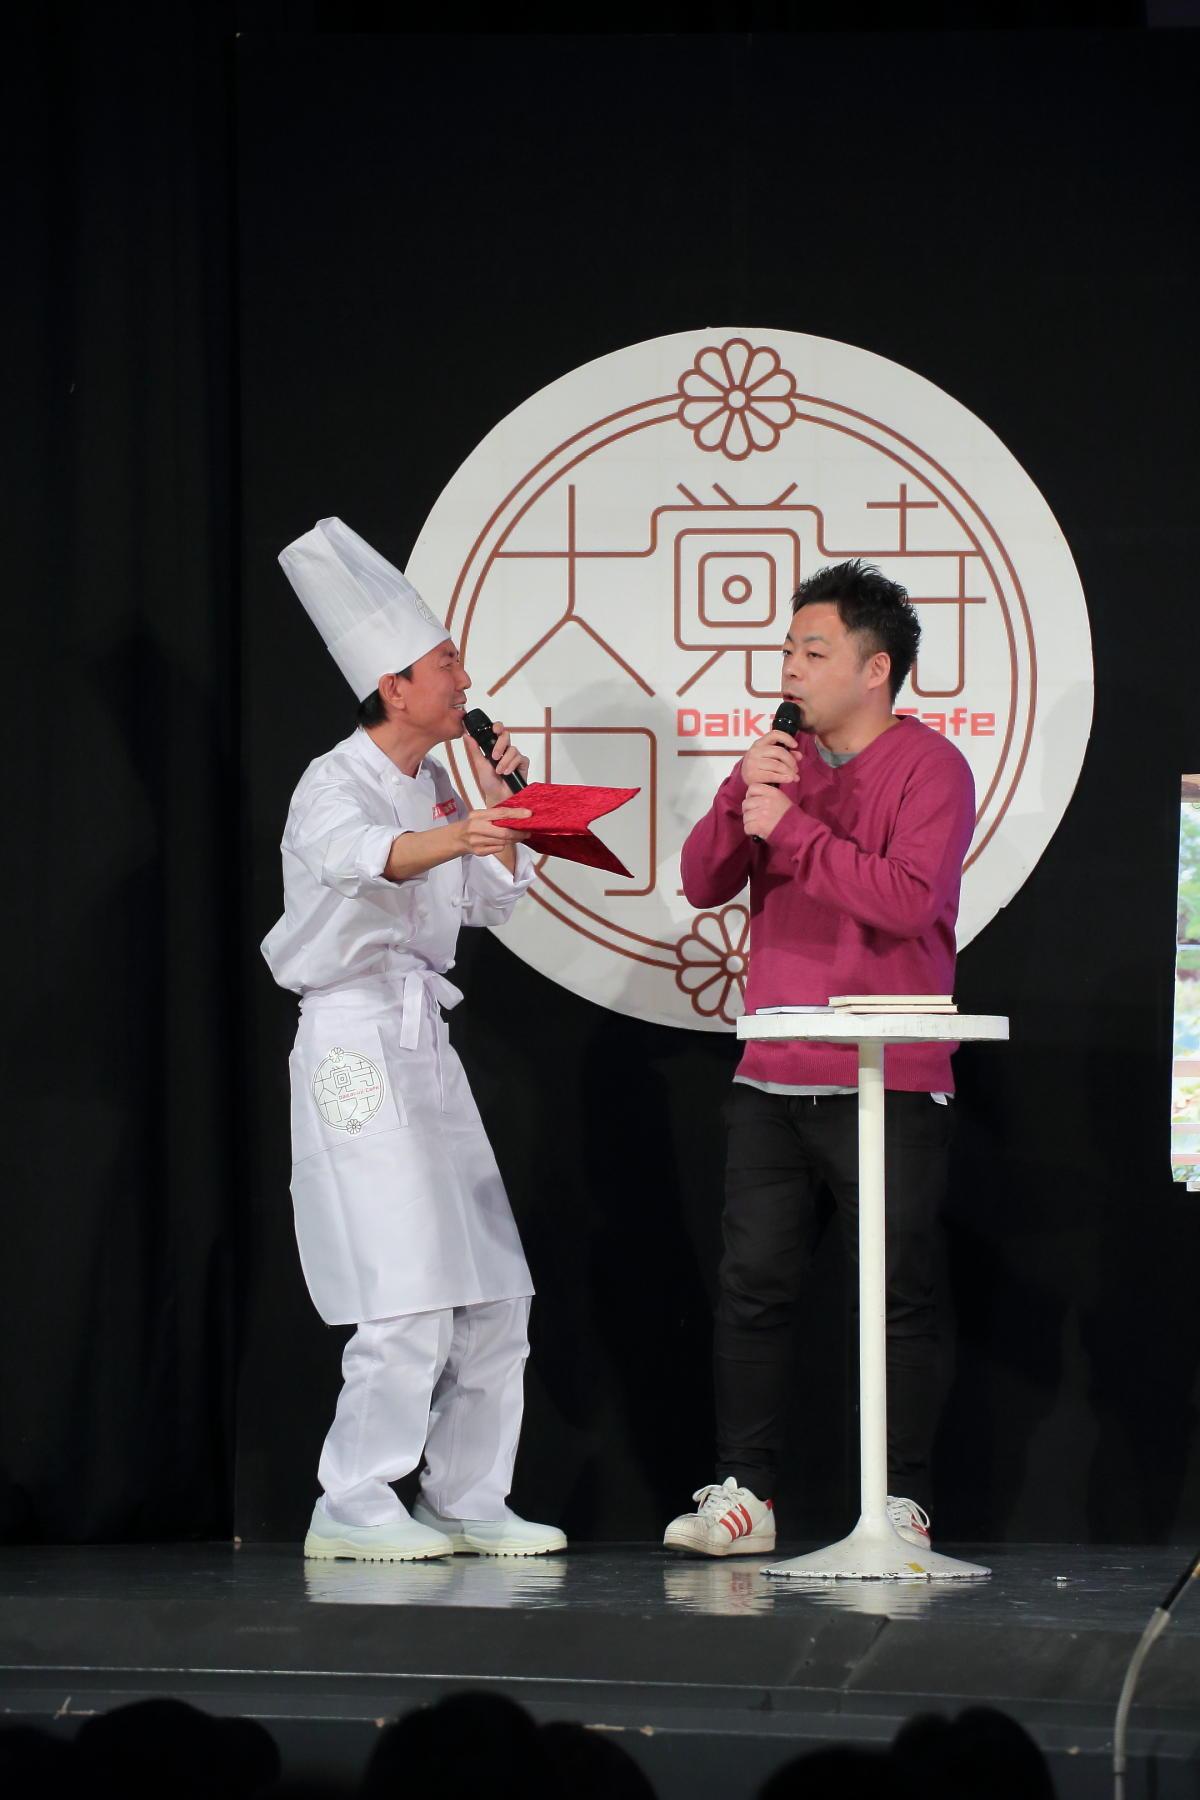 http://news.yoshimoto.co.jp/20170316064136-c34d52ca857d9ed5ebda4a09ad2dd0e12091d558.jpg